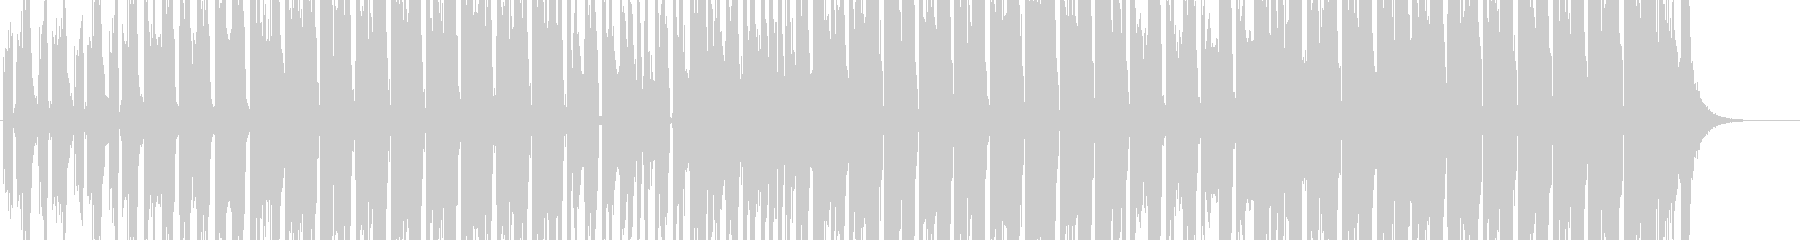 EDM系 和風ファンクなアガるEDM!②の未再生の波形